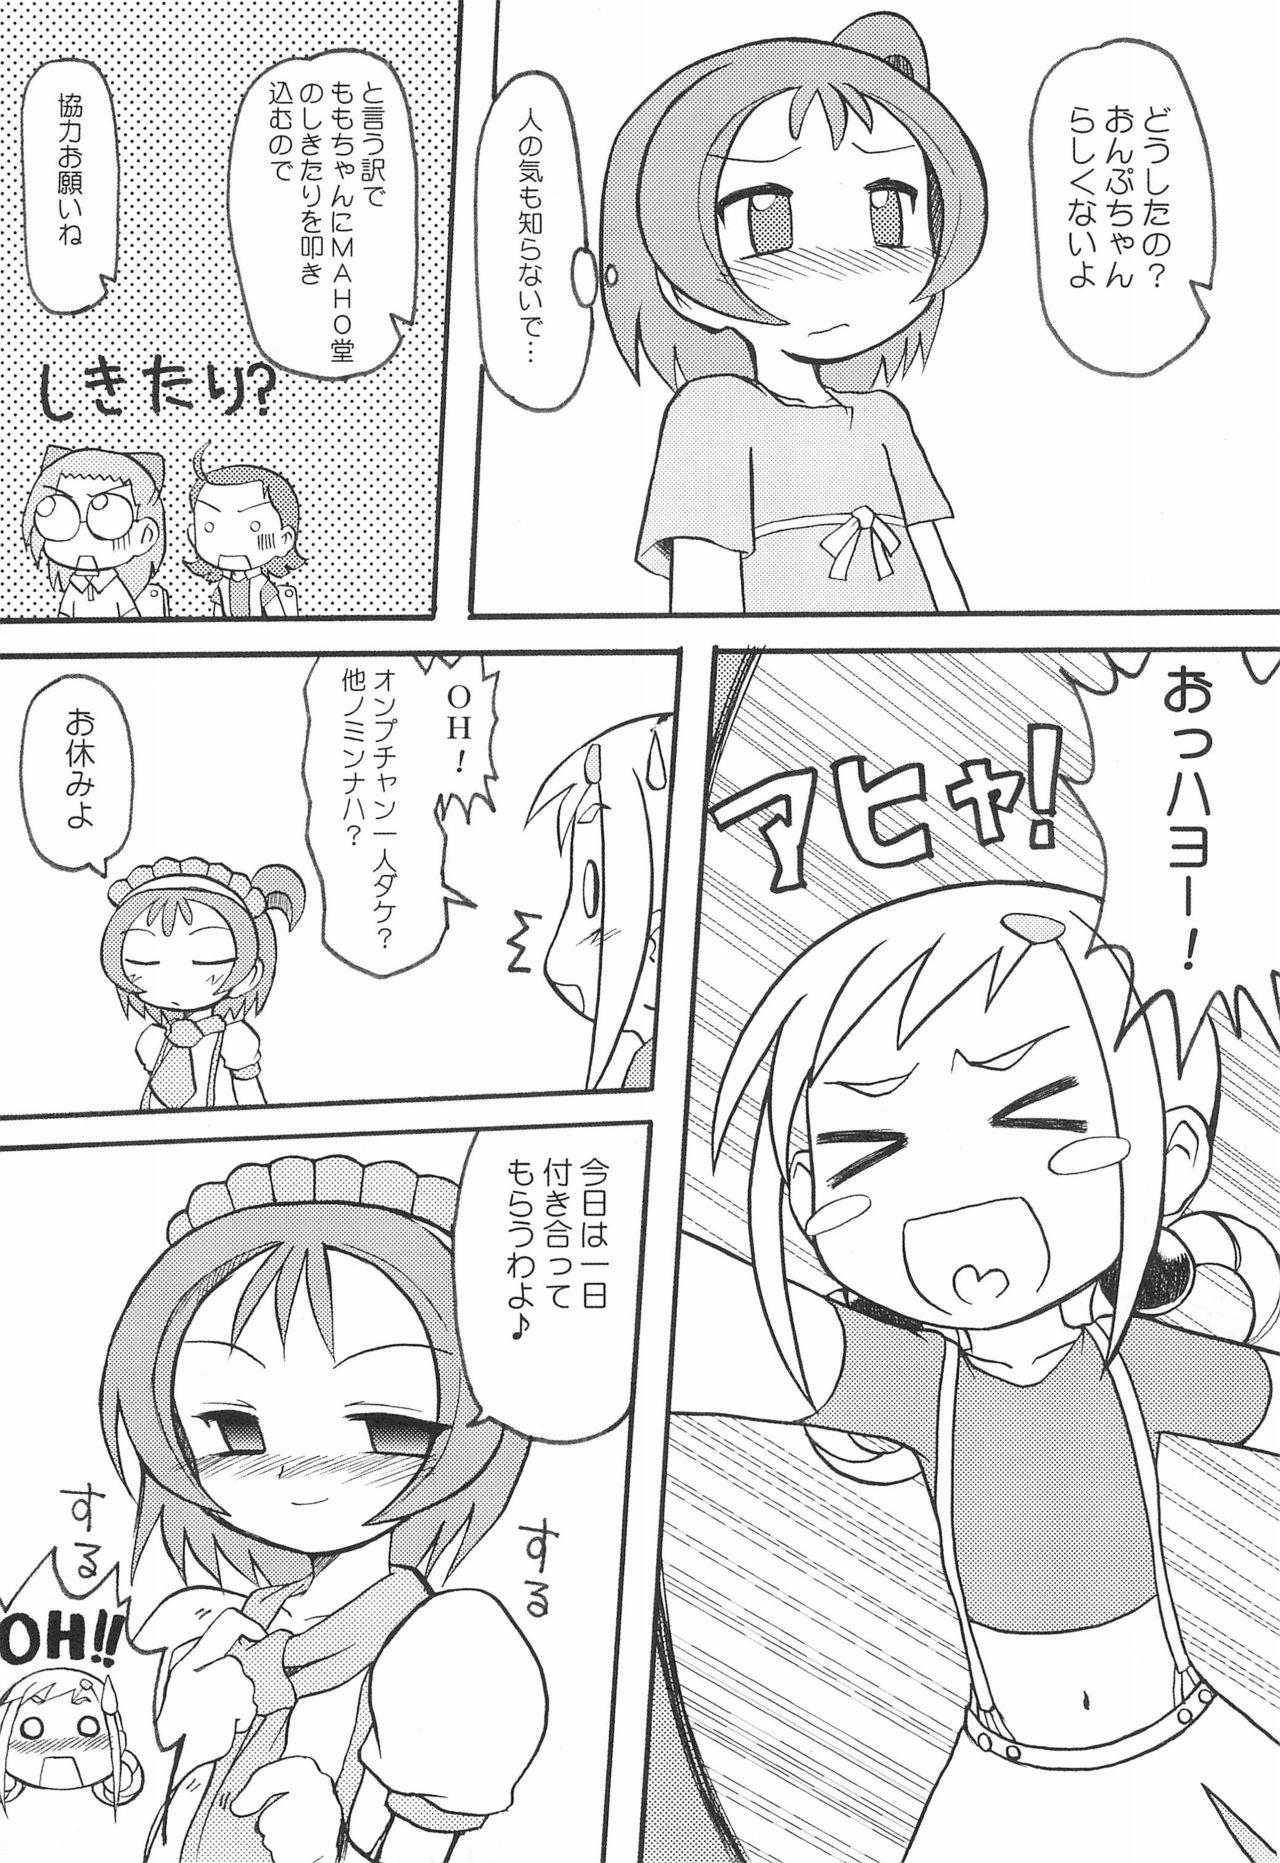 Momo no Kanzume 5